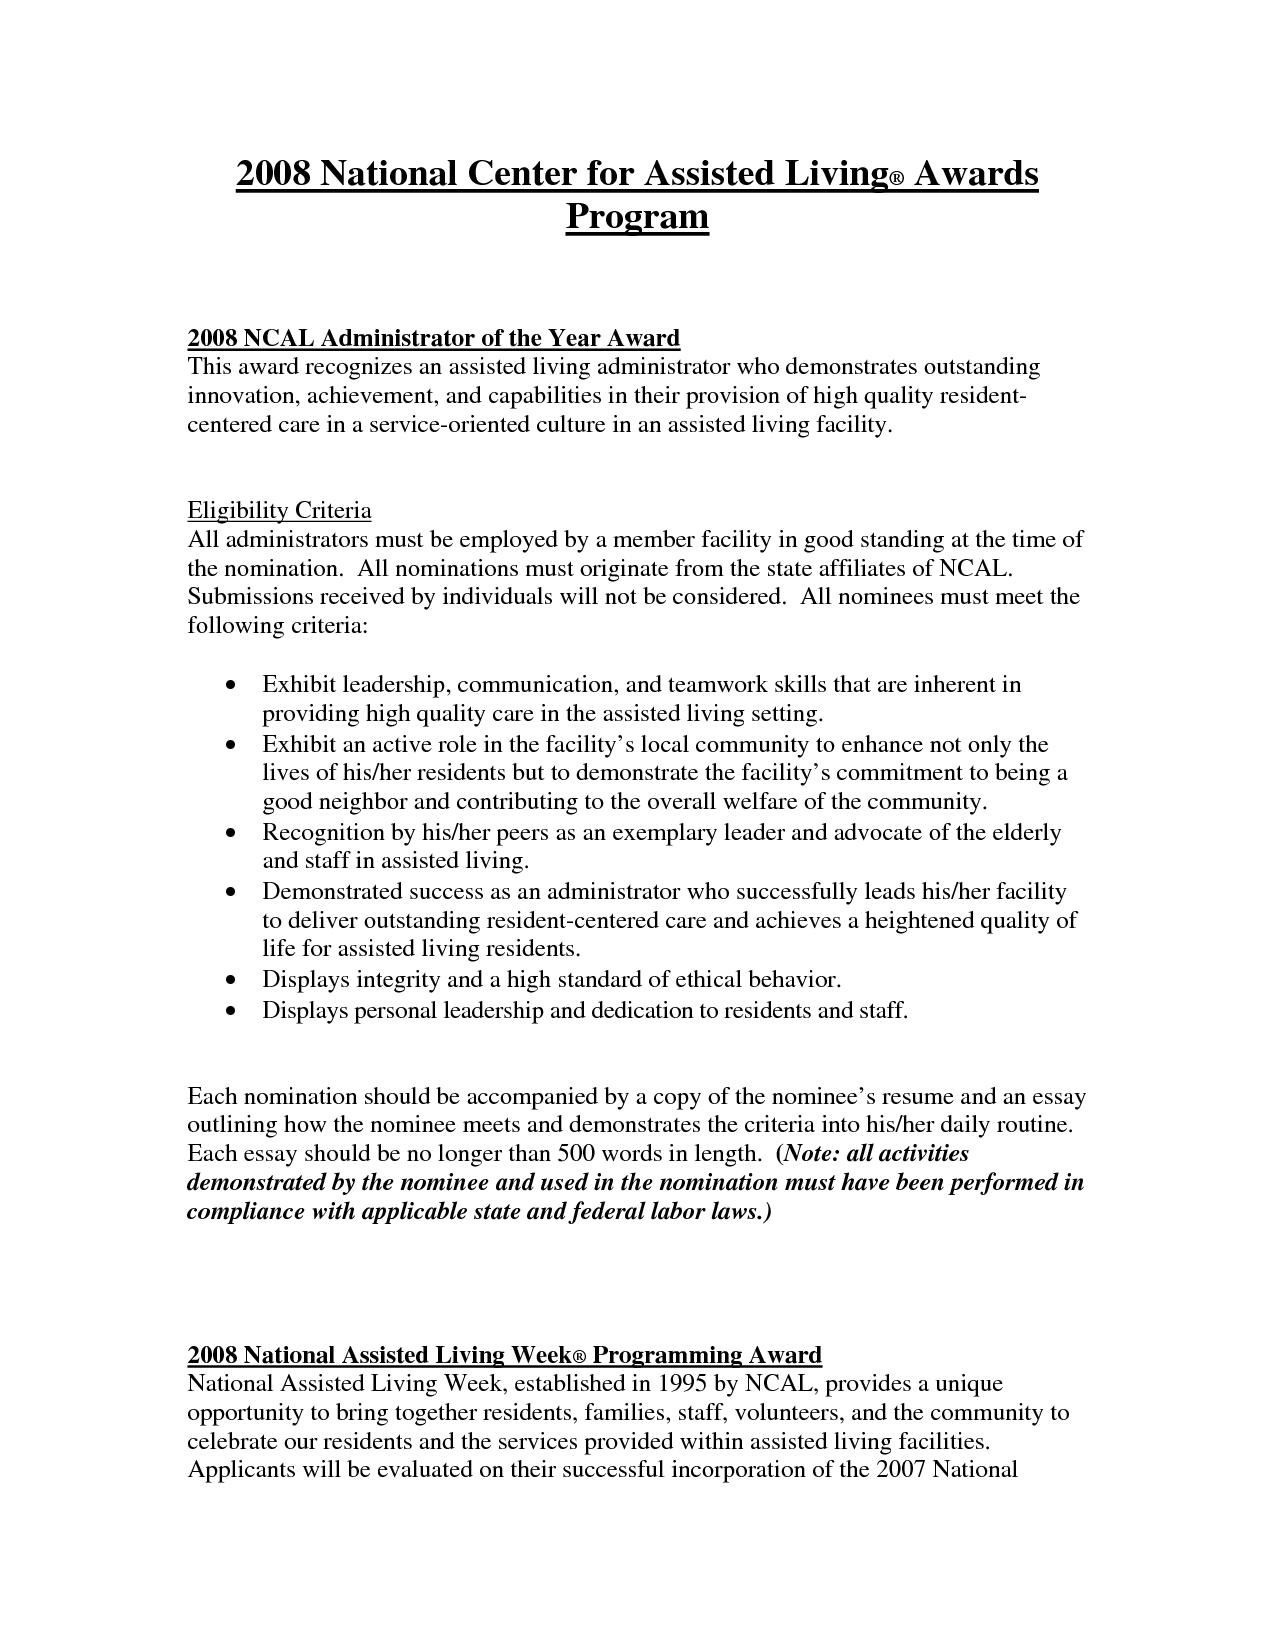 Service canada resume help